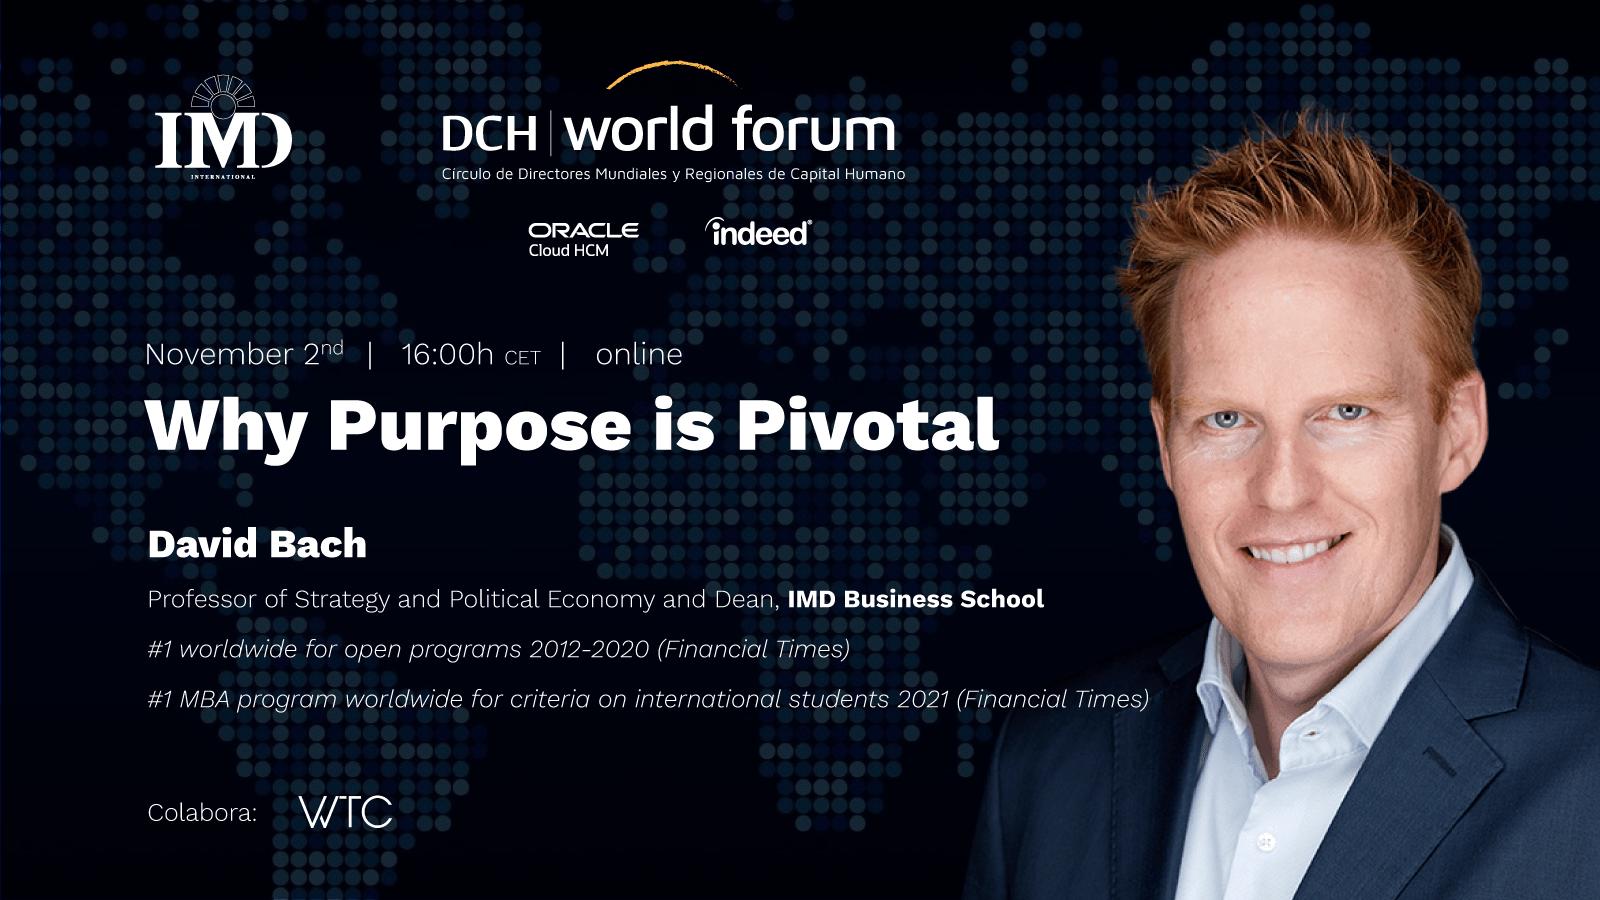 dch world forum2